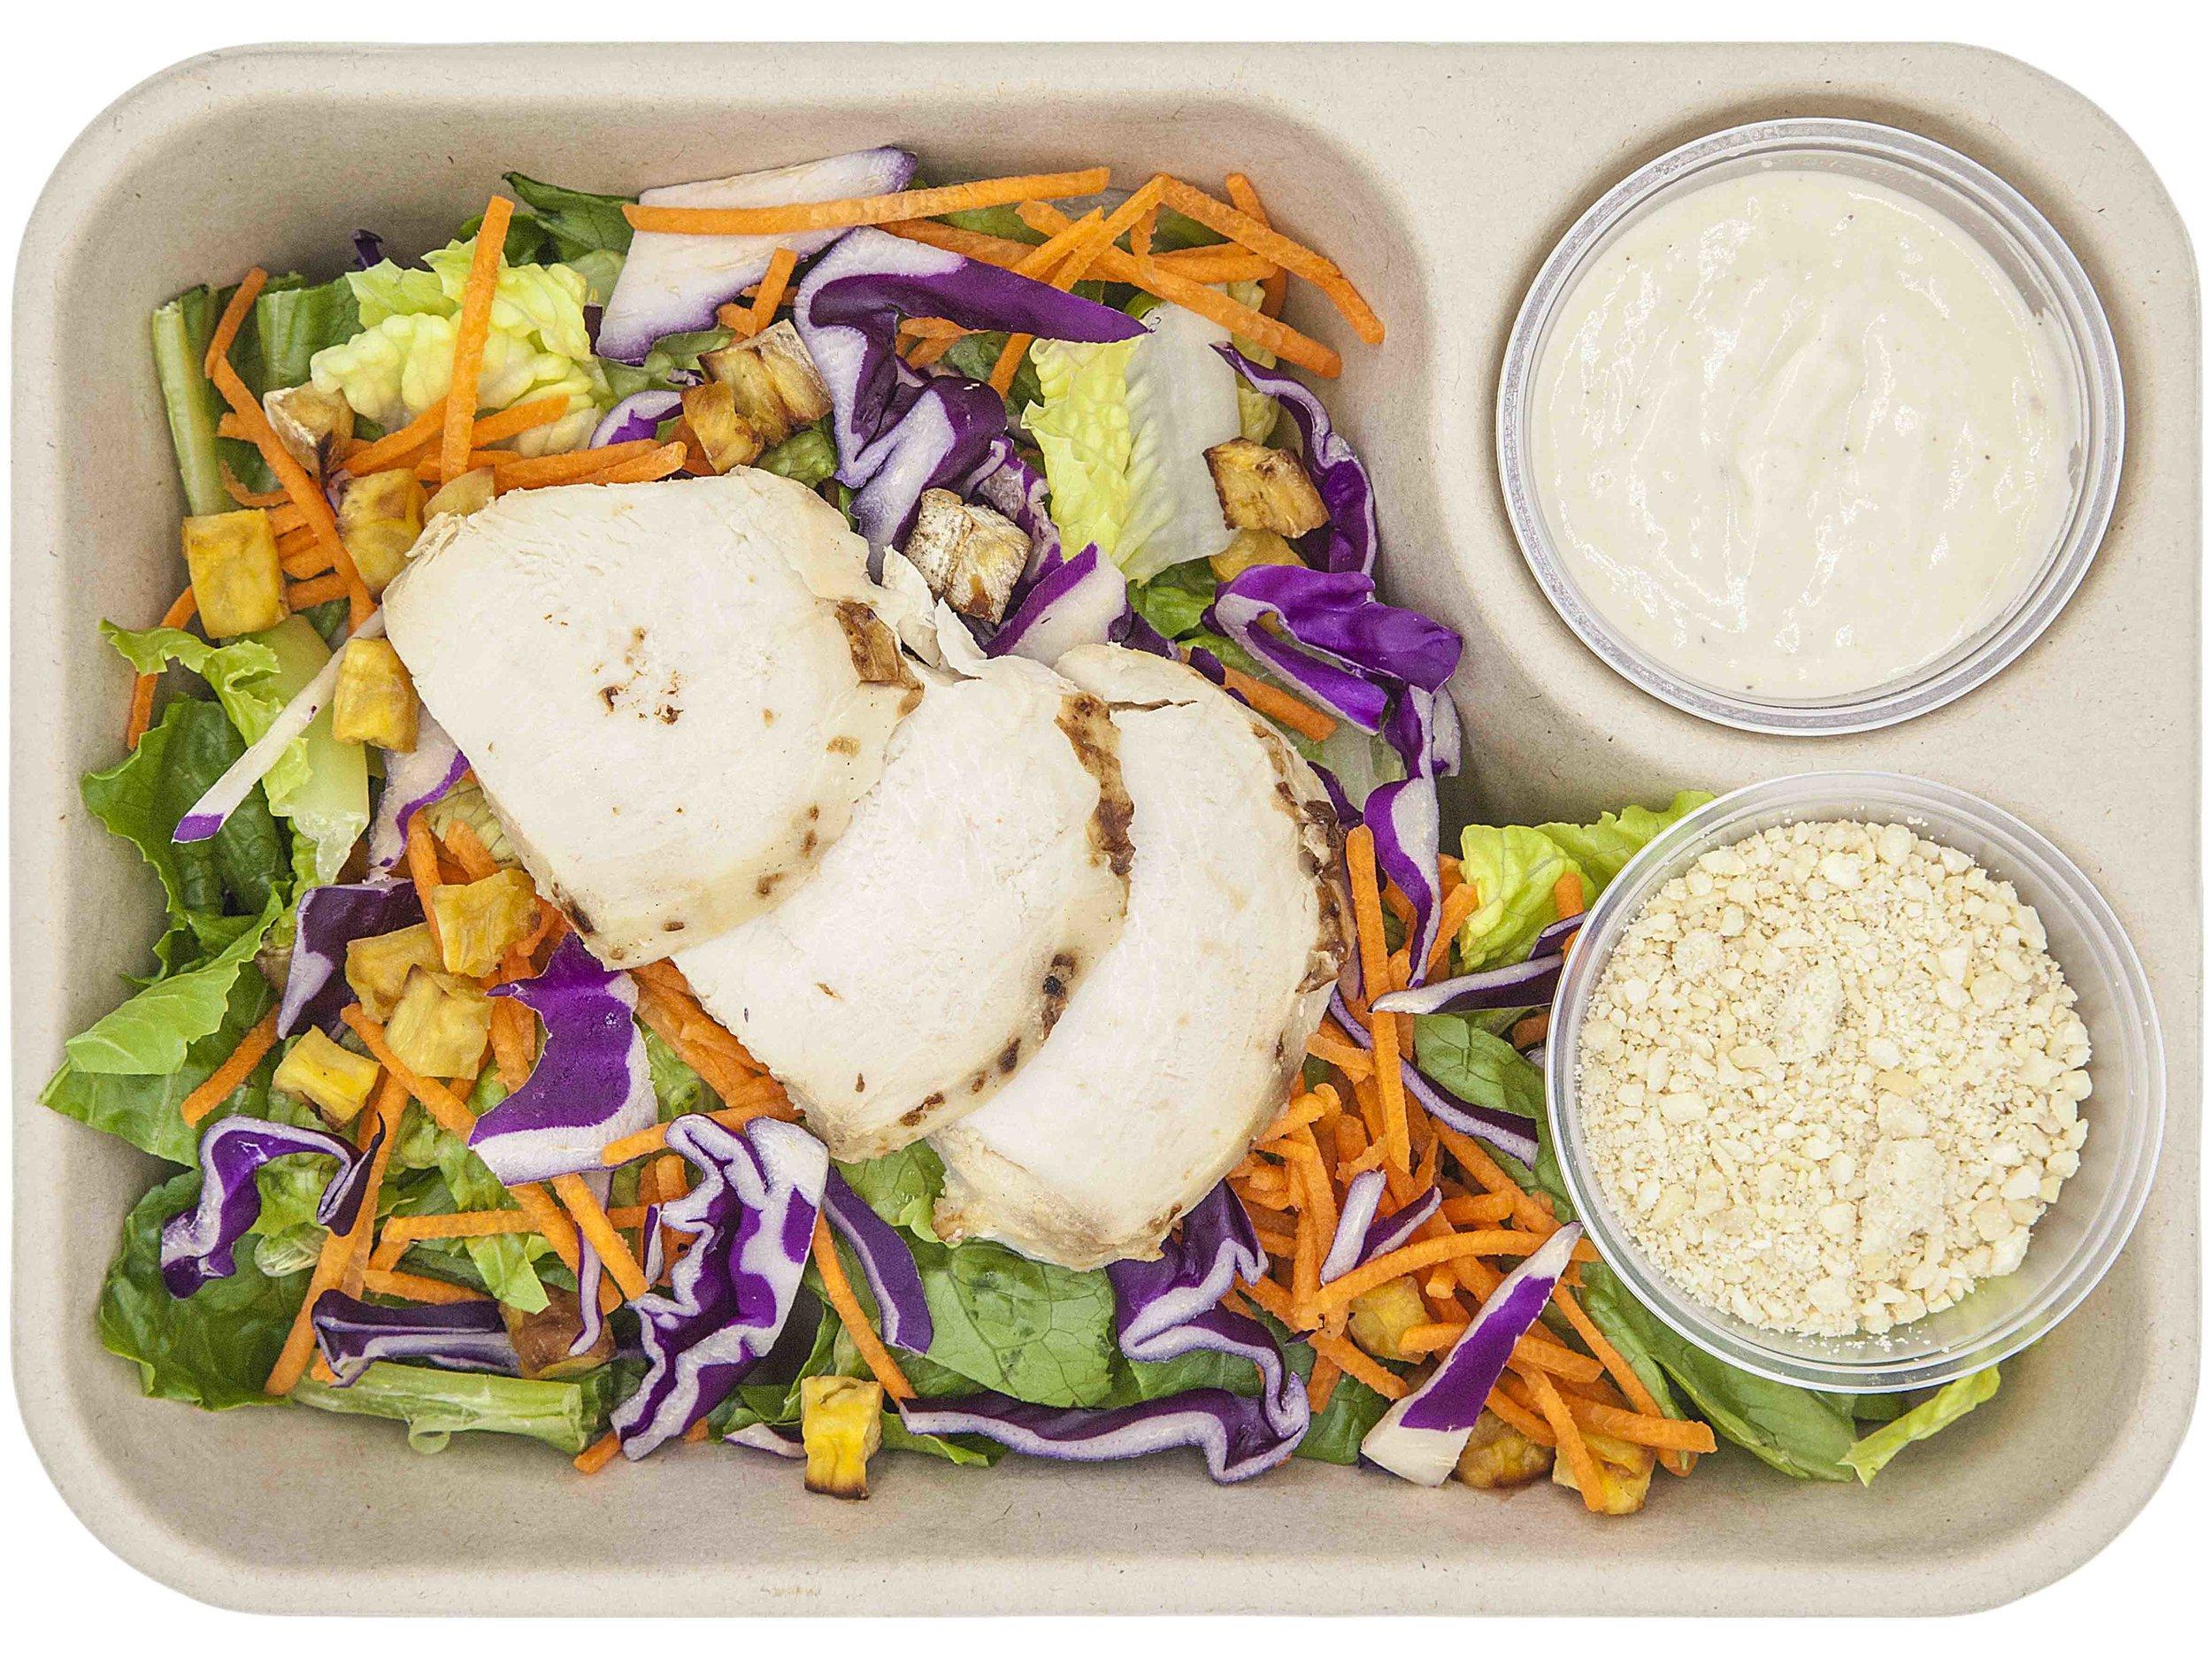 CHICKEN CAESAR356.8 KCAL PER SERVINGINGREDIENTS: diced sweet potato, romaine lettuce, vegan parmesan chesse, sliced chicken breast, 12noon caesar dressing -